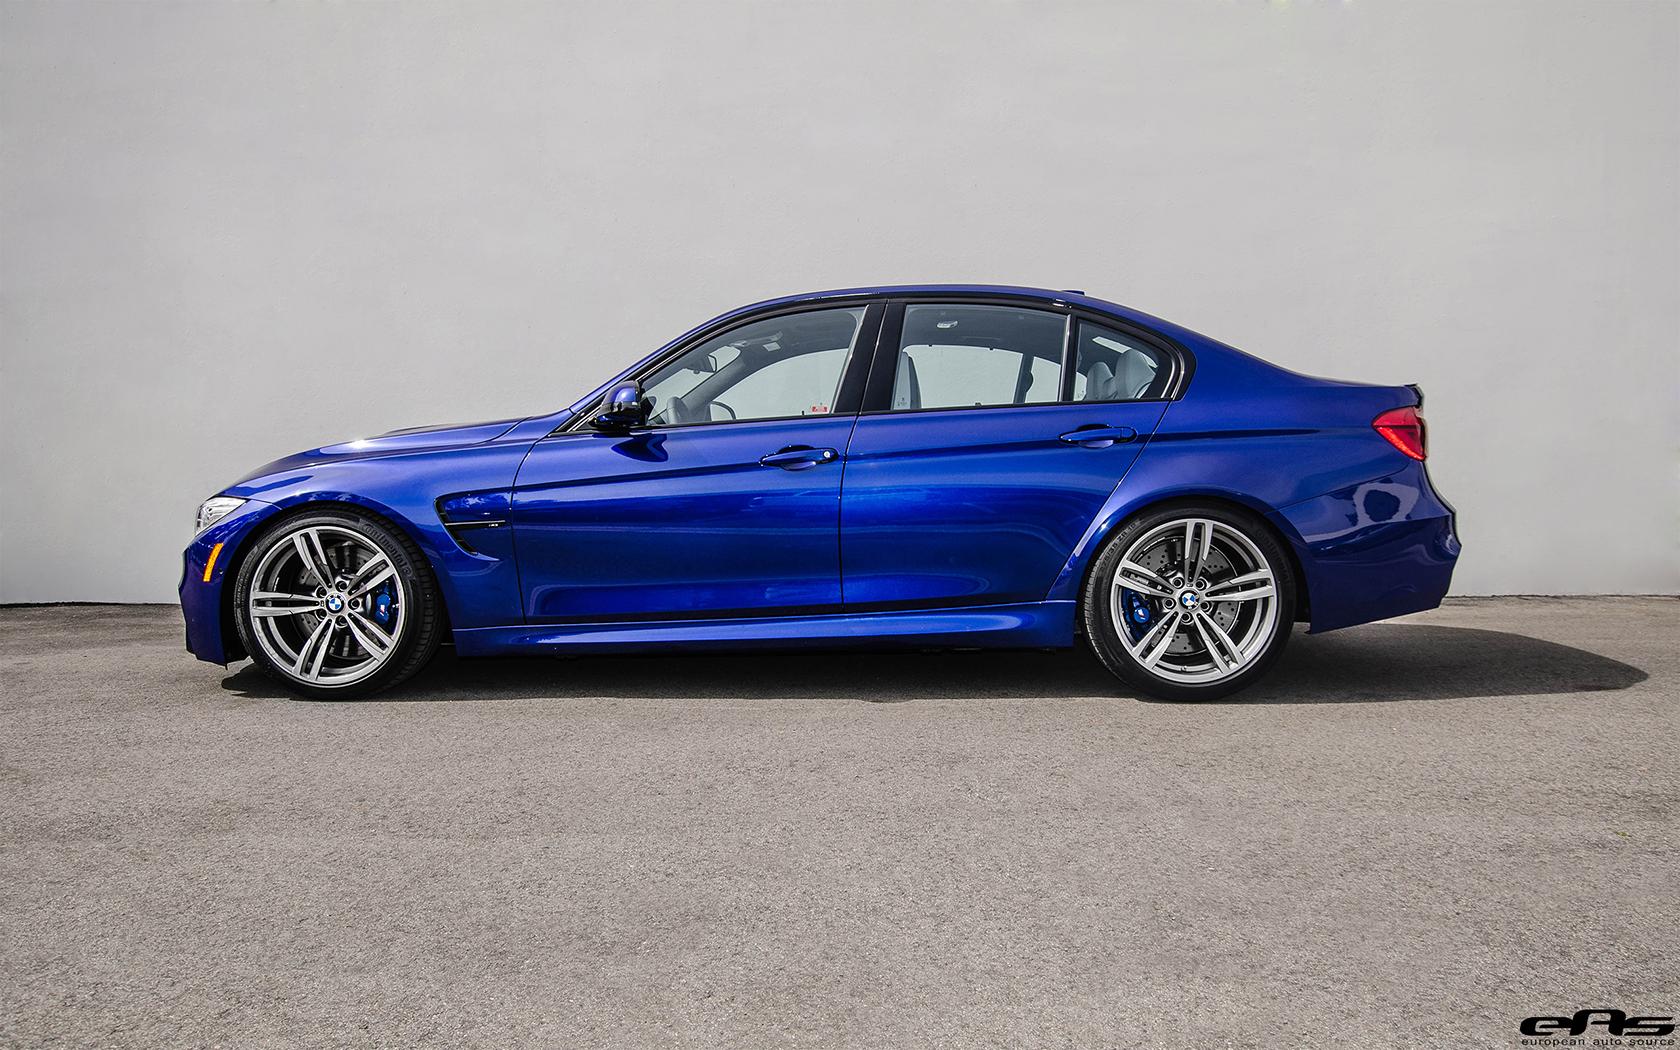 Subtle Modifications For A San Marino Blue BMW M3